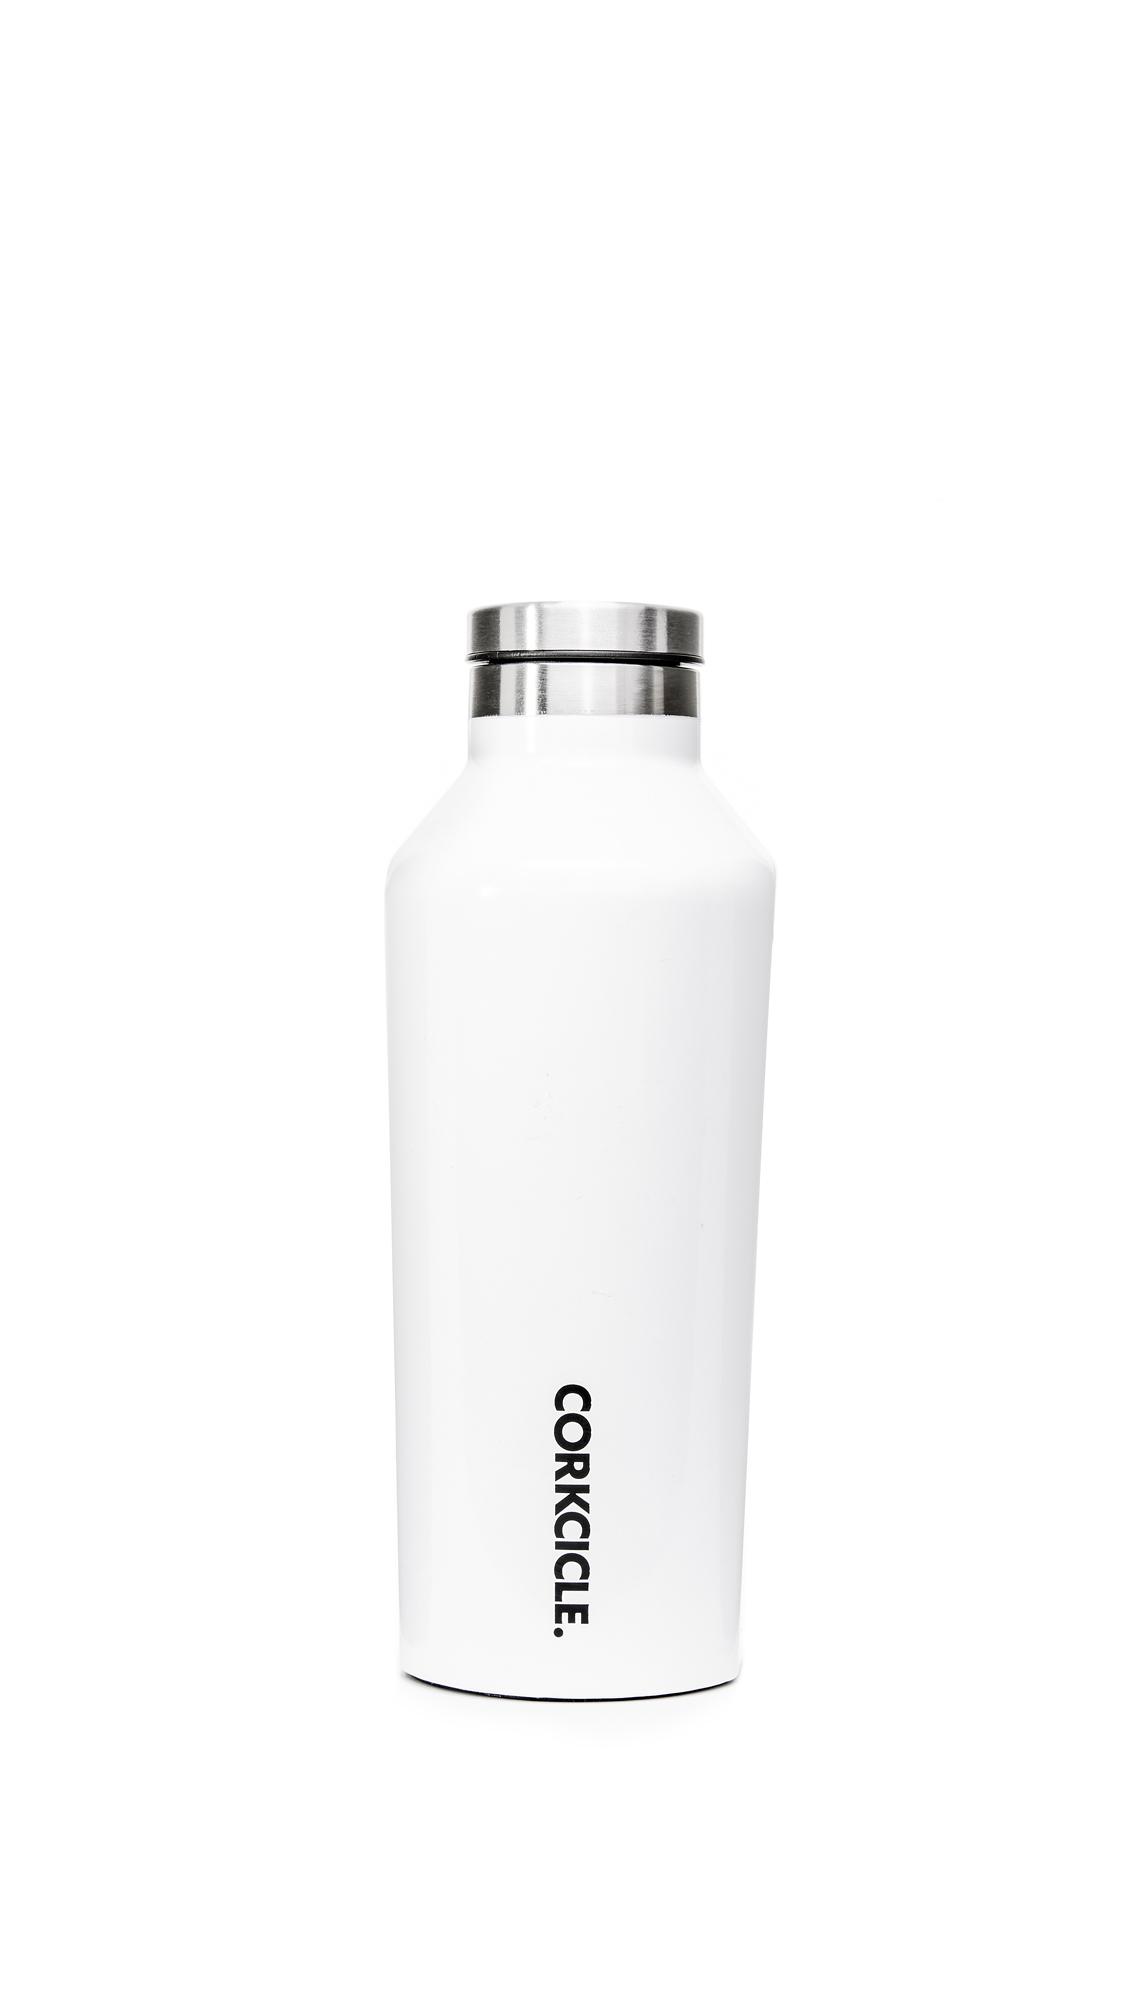 Corkcicle Gloss 9oz Canteen - Gloss White